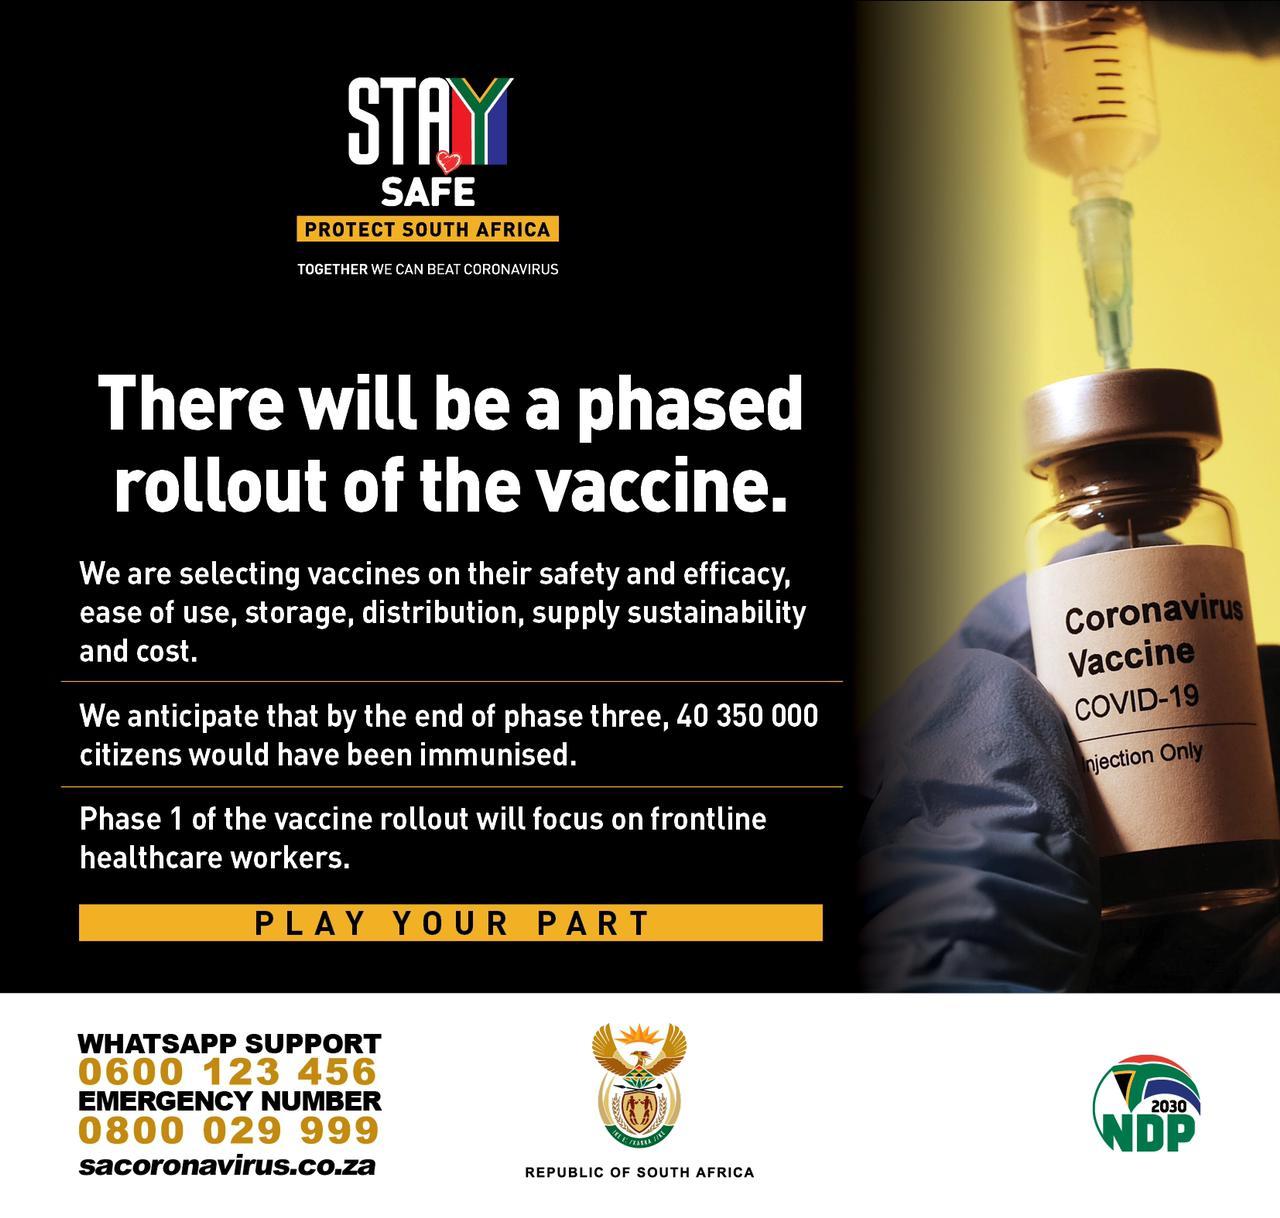 corona Impfung suedafrika